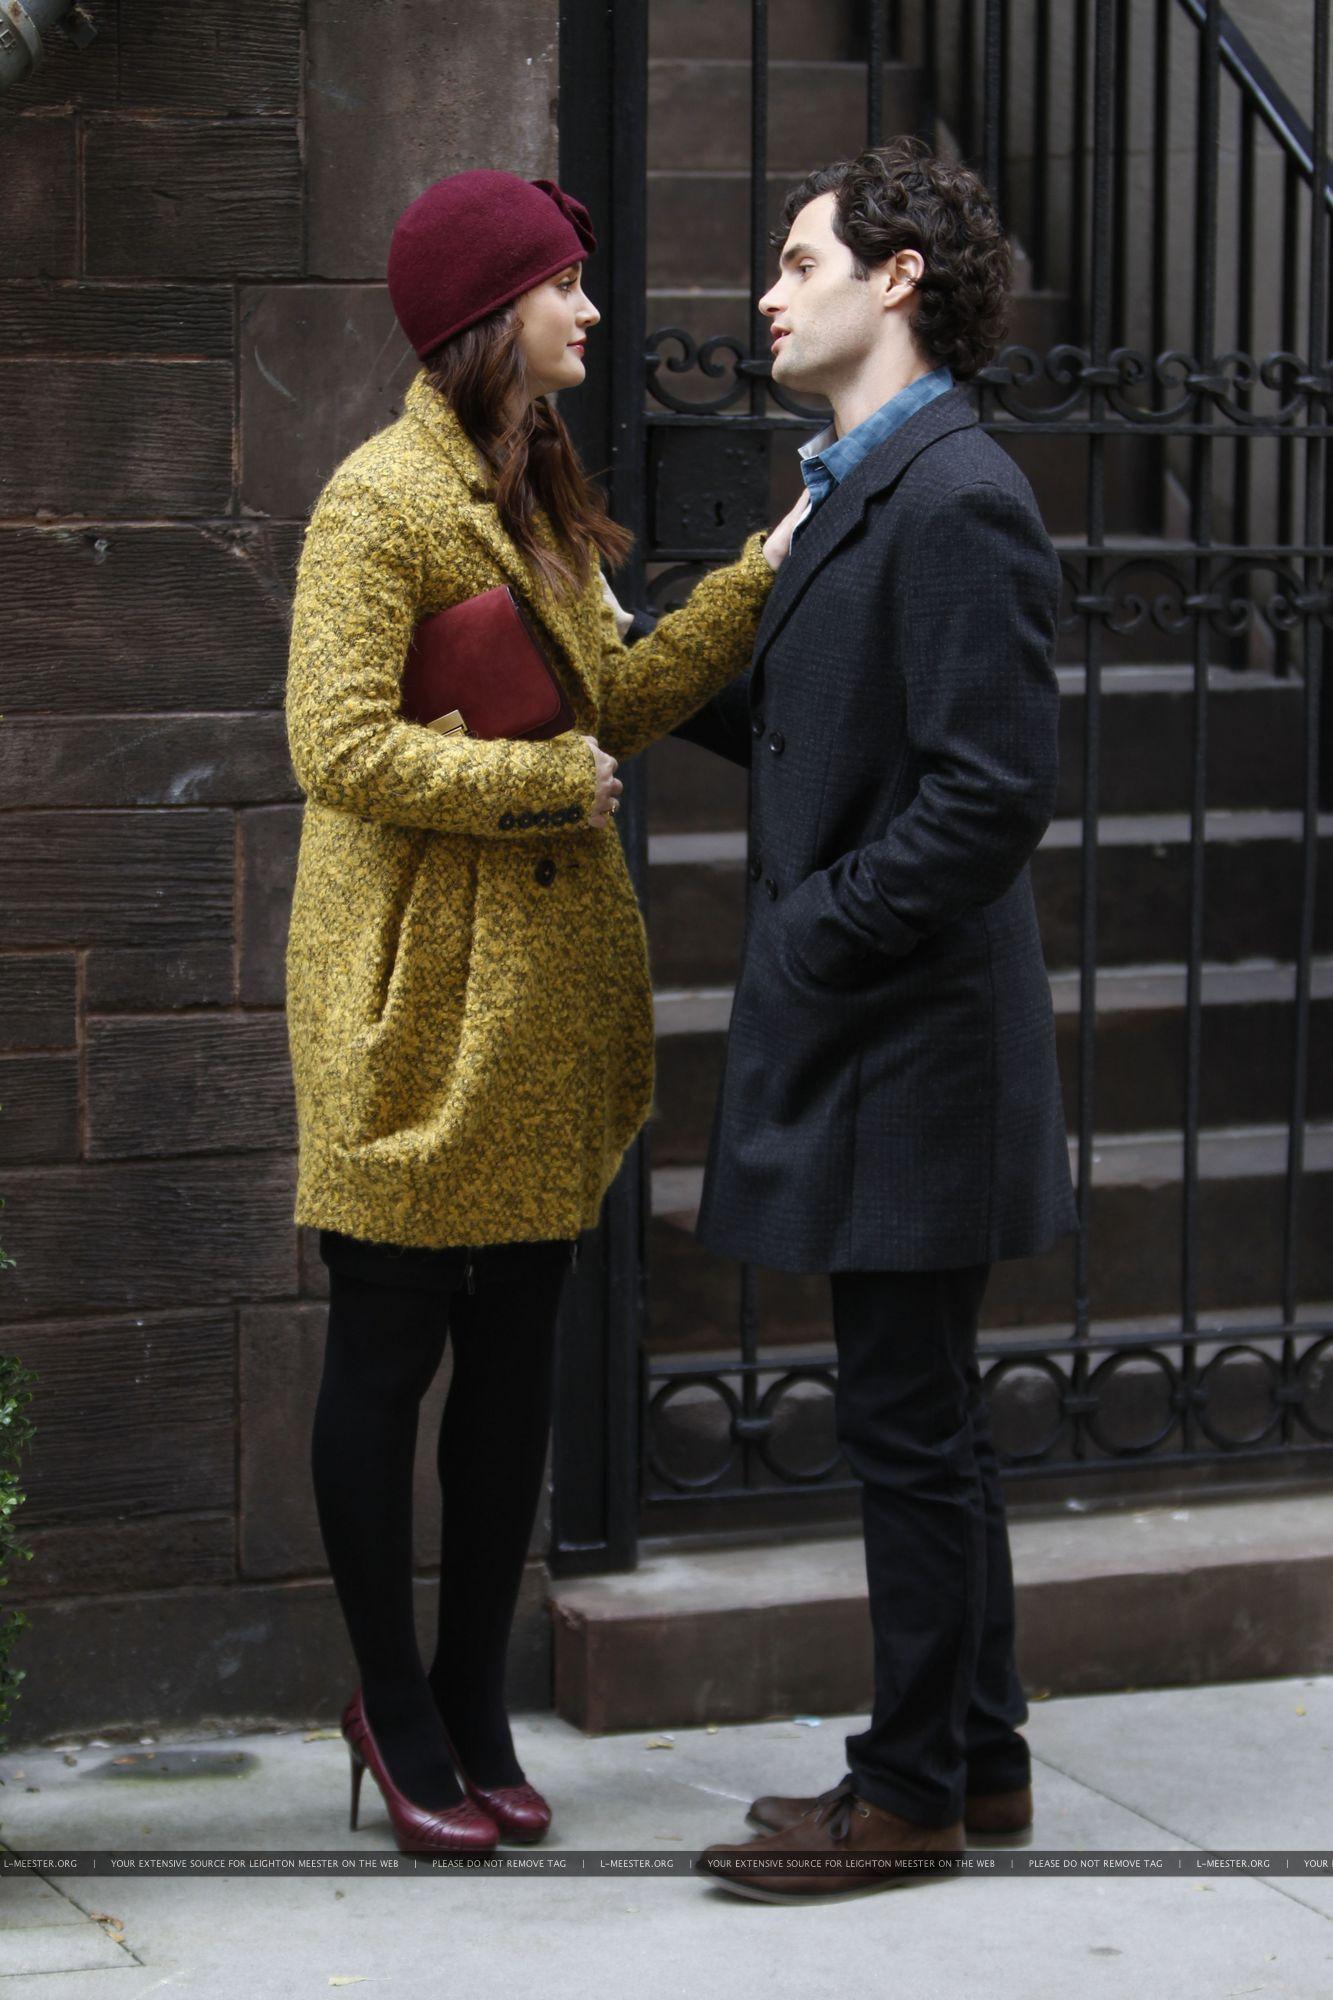 On the set of Gossip Girl - October 31